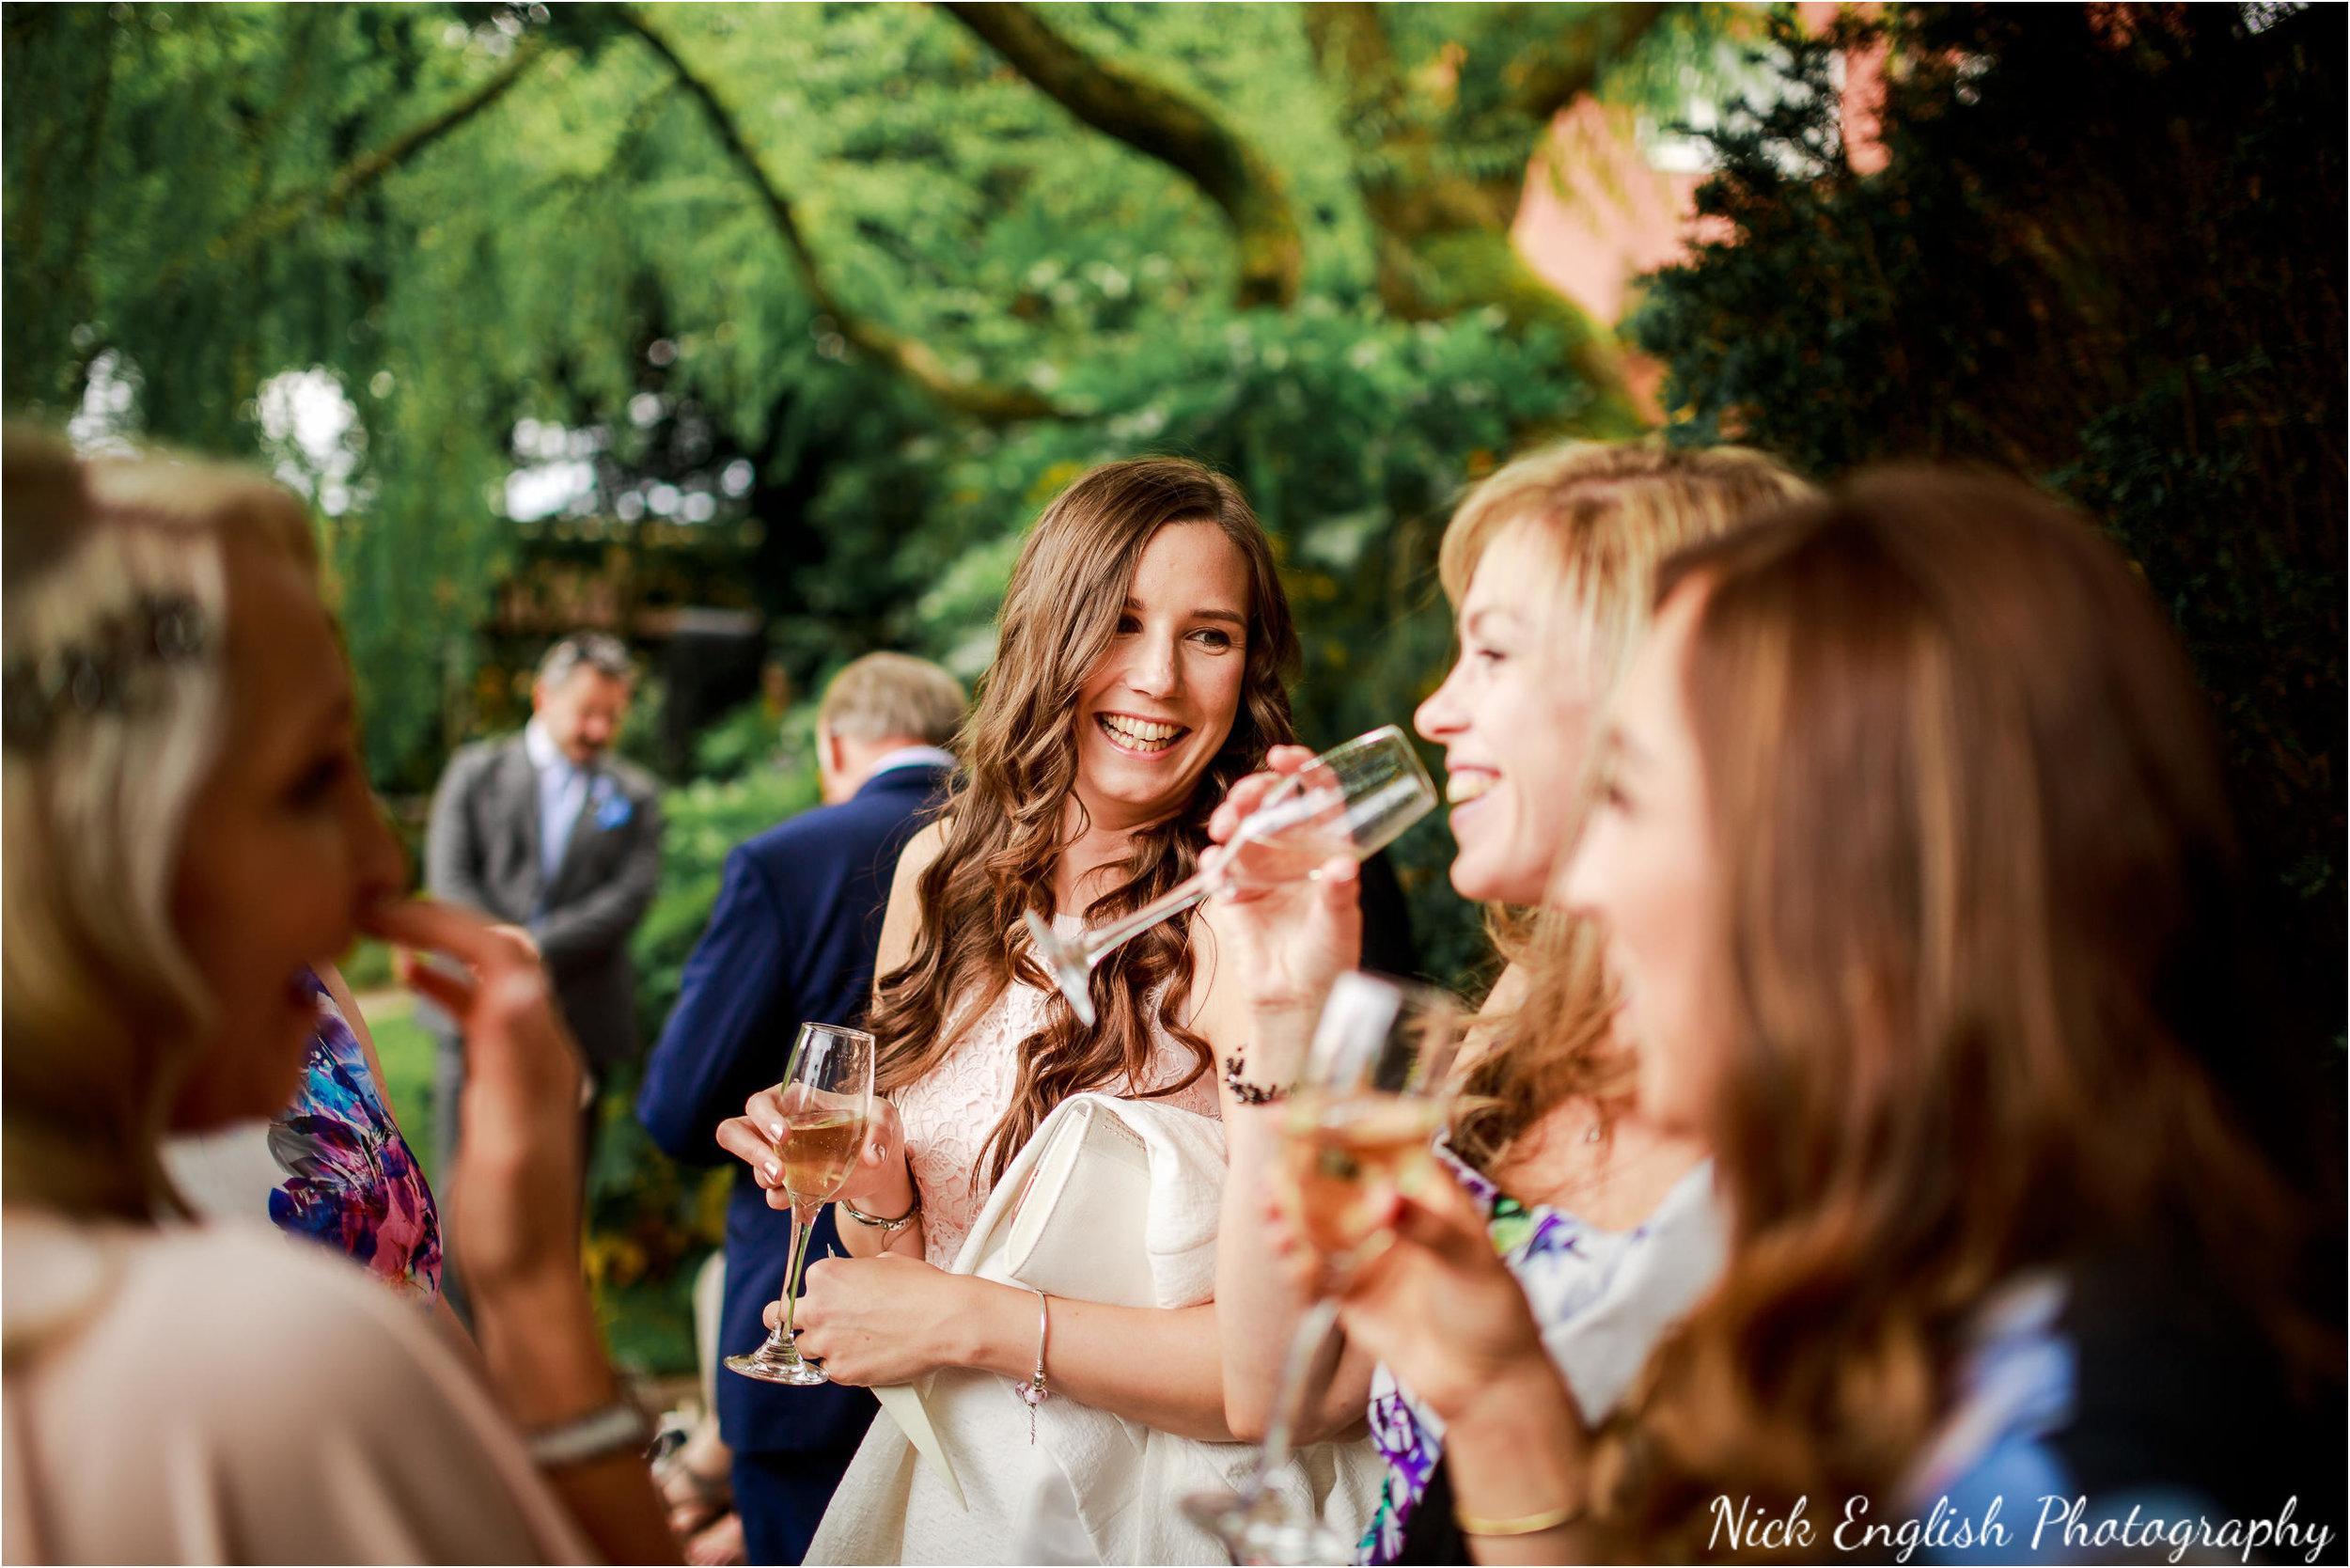 Emily David Wedding Photographs at Barton Grange Preston by Nick English Photography 133jpg.jpeg